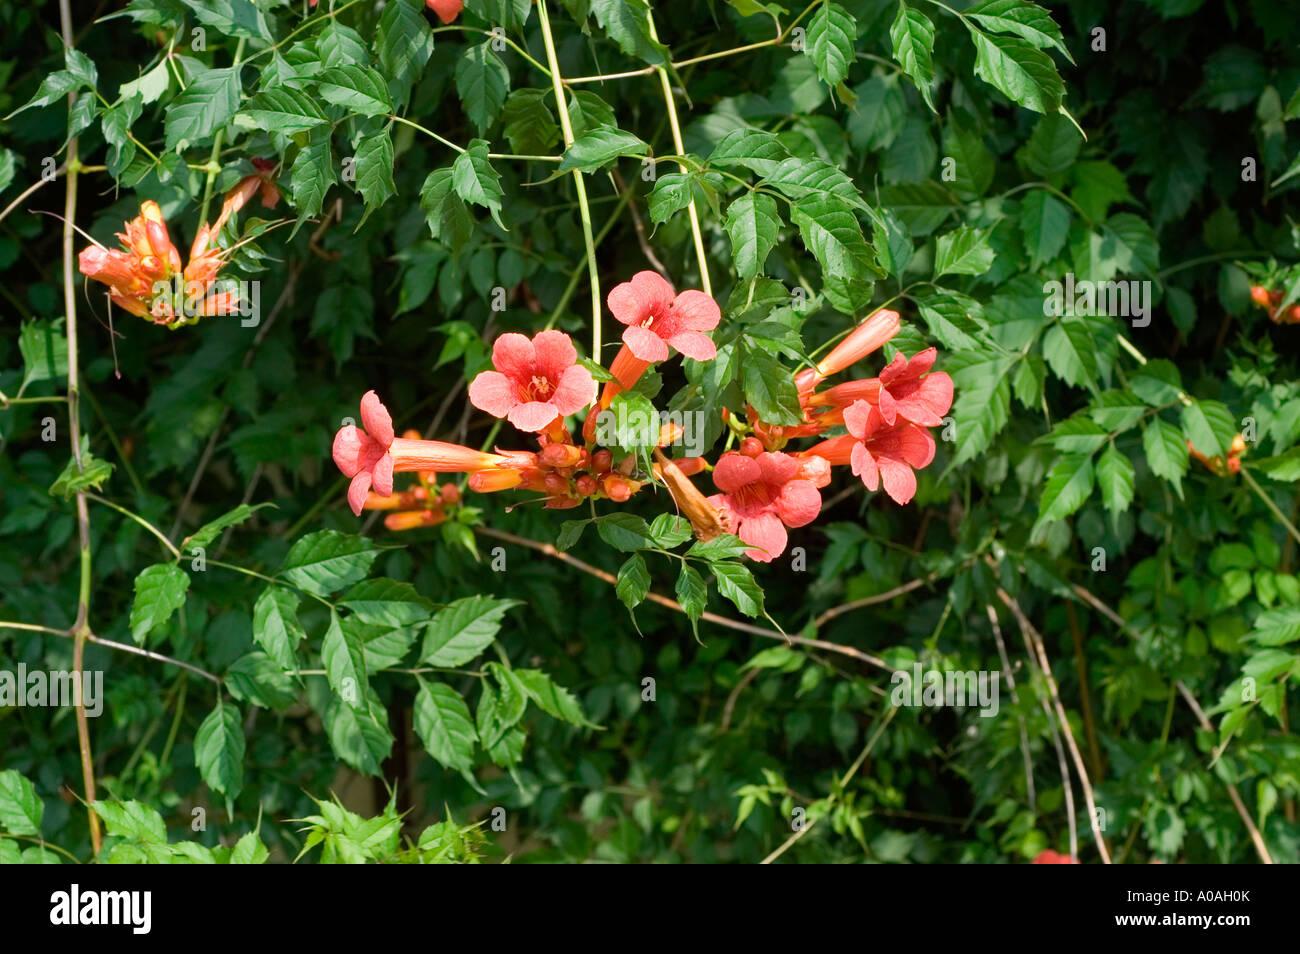 Pink and orange flowers of trumpet vine campsis radicans america pink and orange flowers of trumpet vine campsis radicans america mightylinksfo